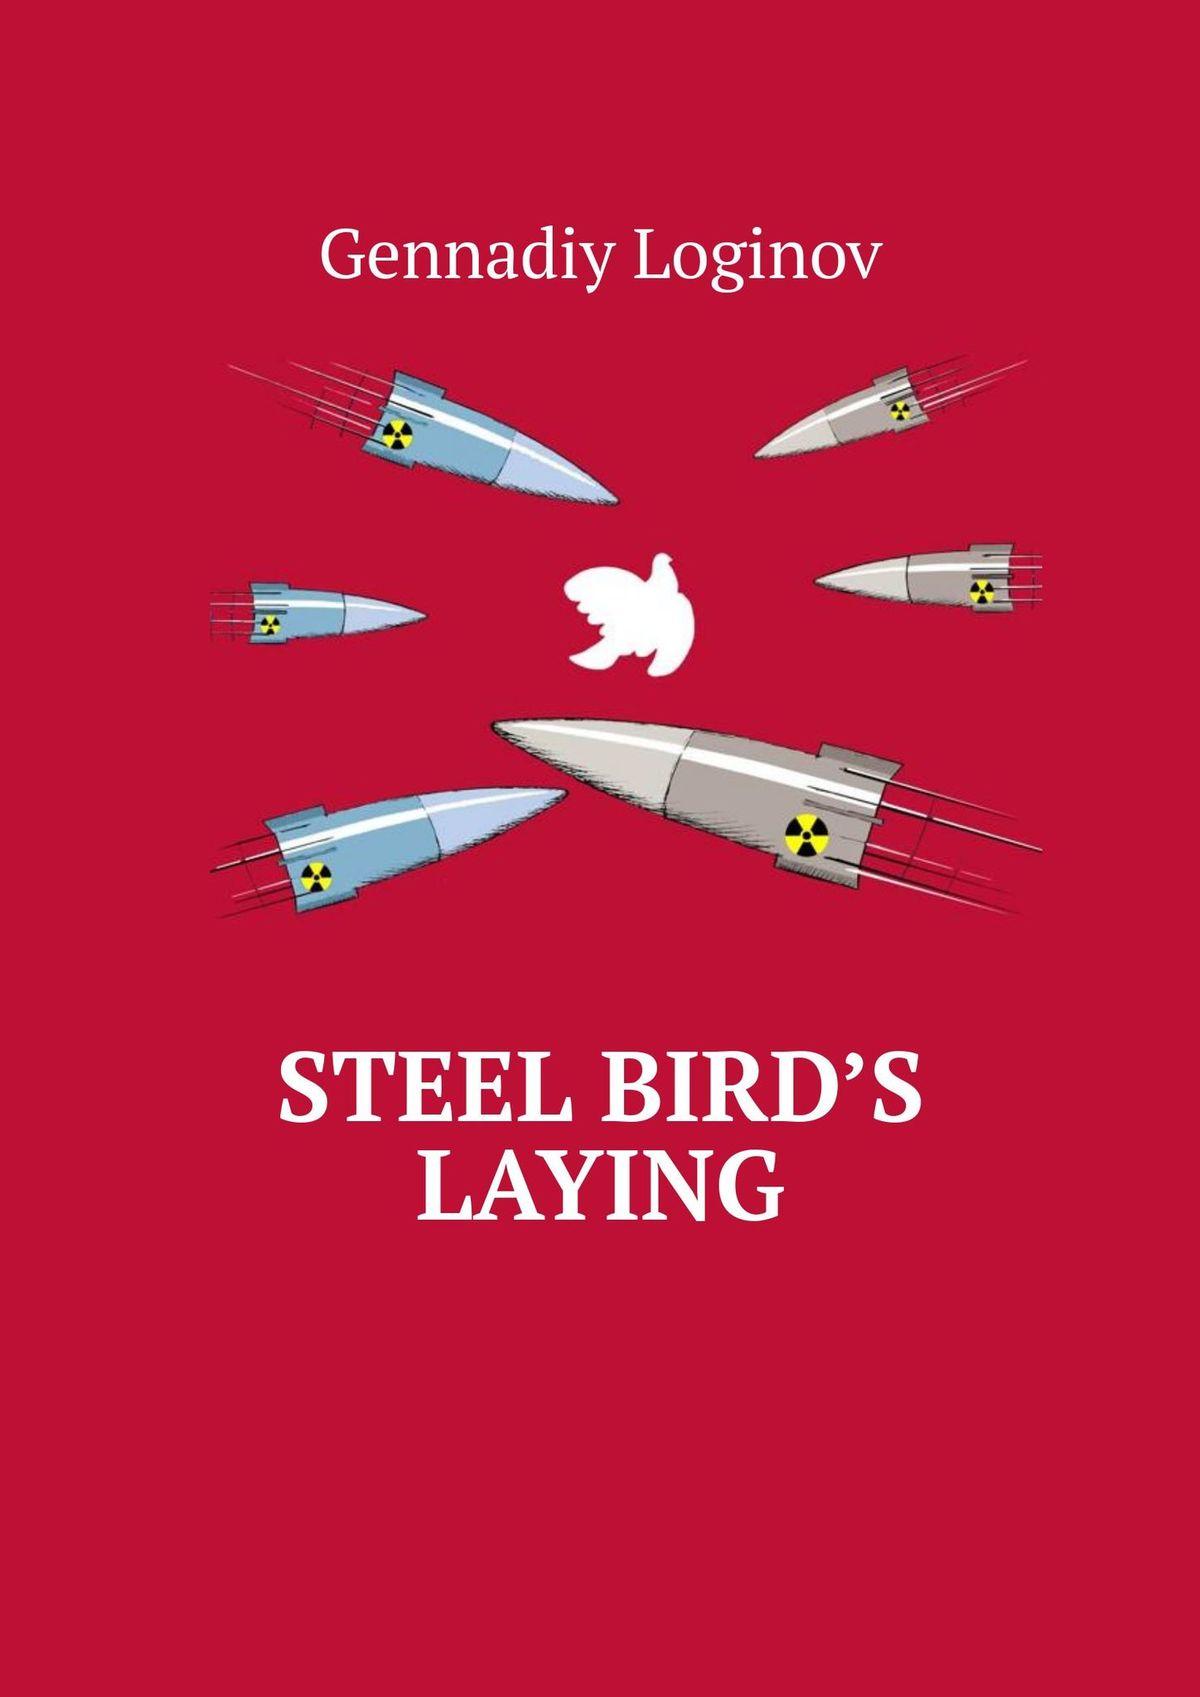 Steel Bird's Laying